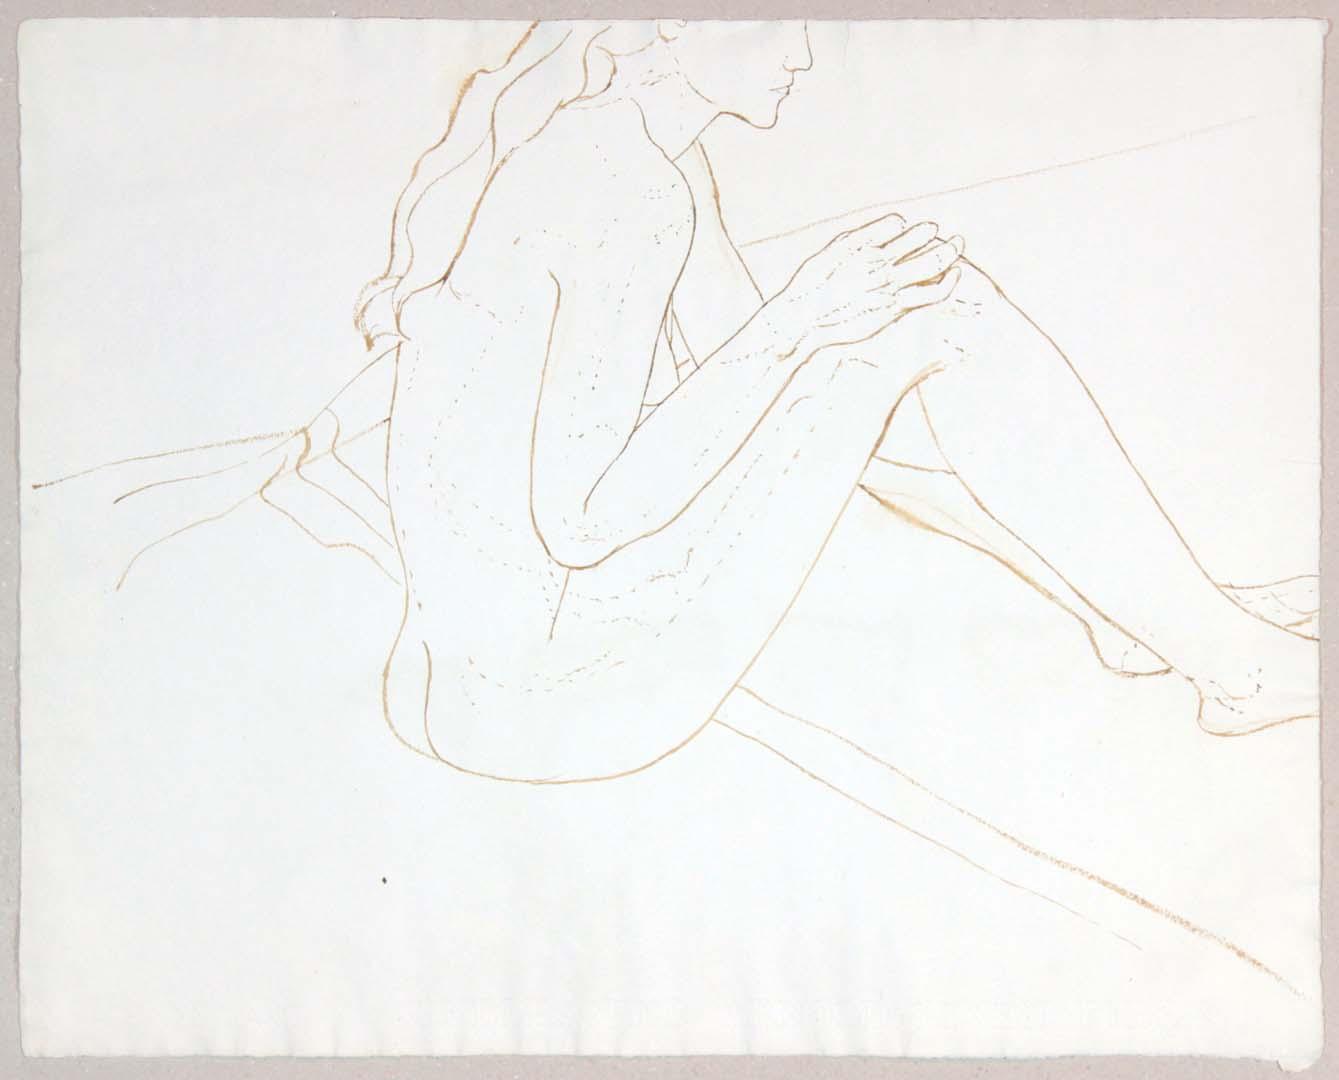 Seated Female Nude Wash 19 x 23.875